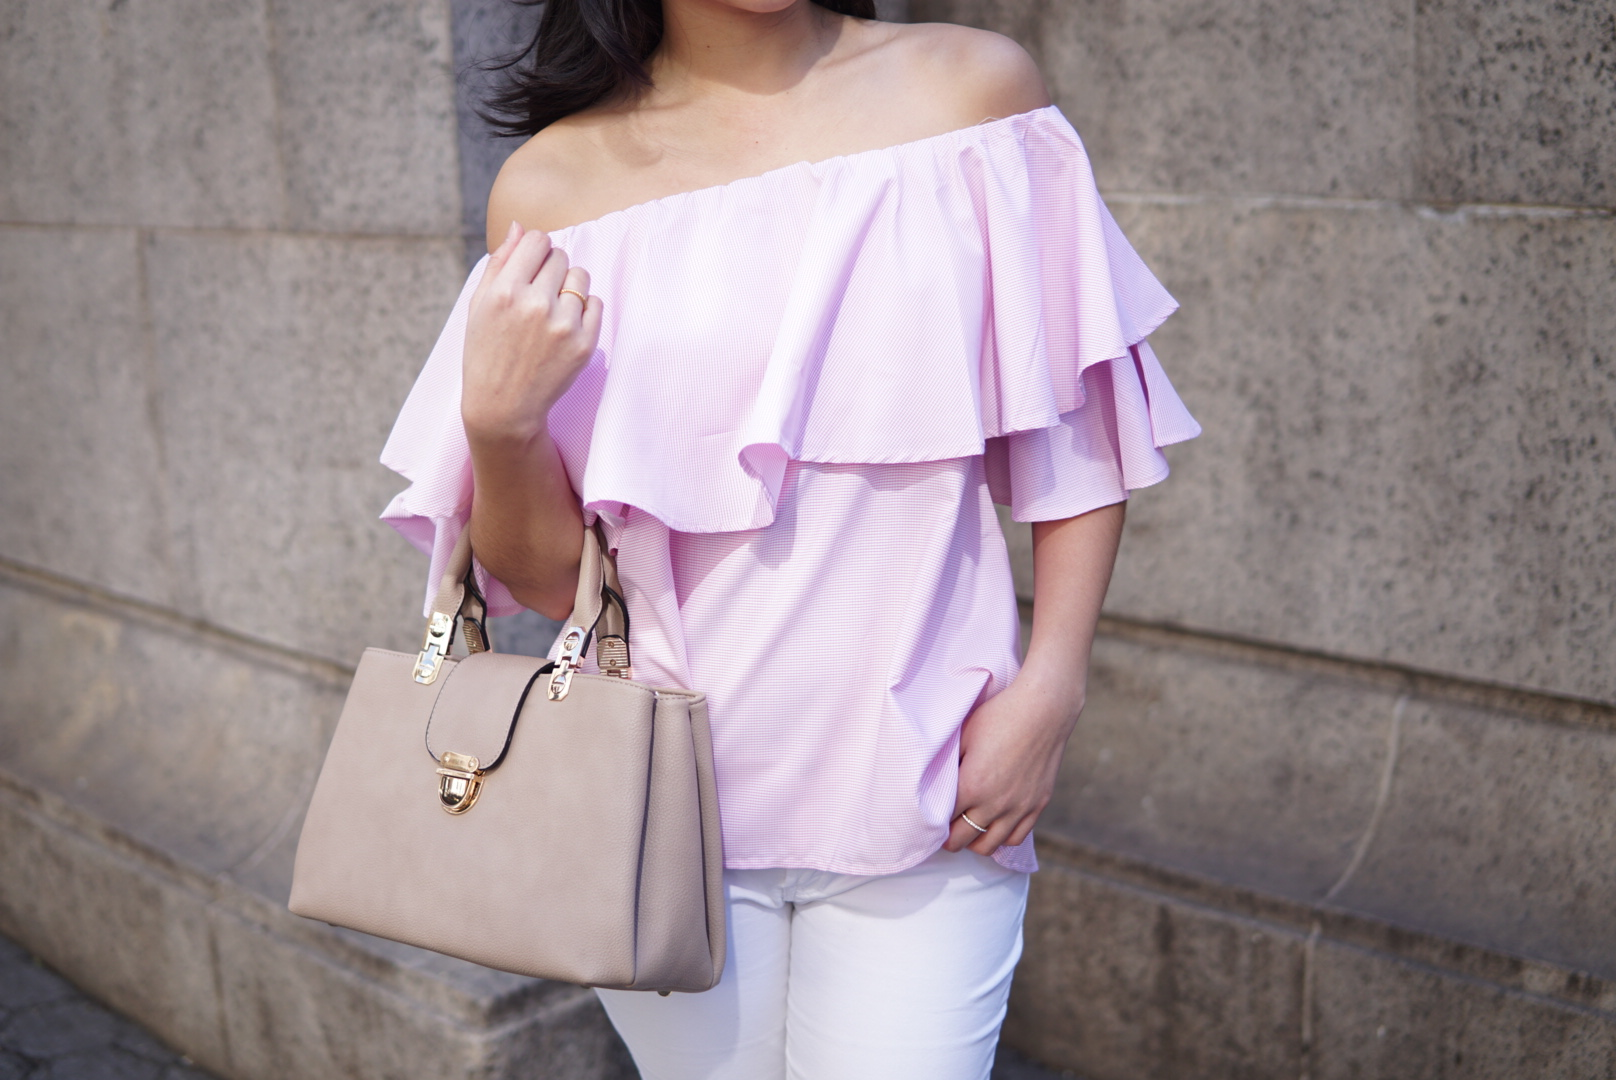 Top:  SheIn  | Bag:  Shop J&G  | White Jeans:  H&M